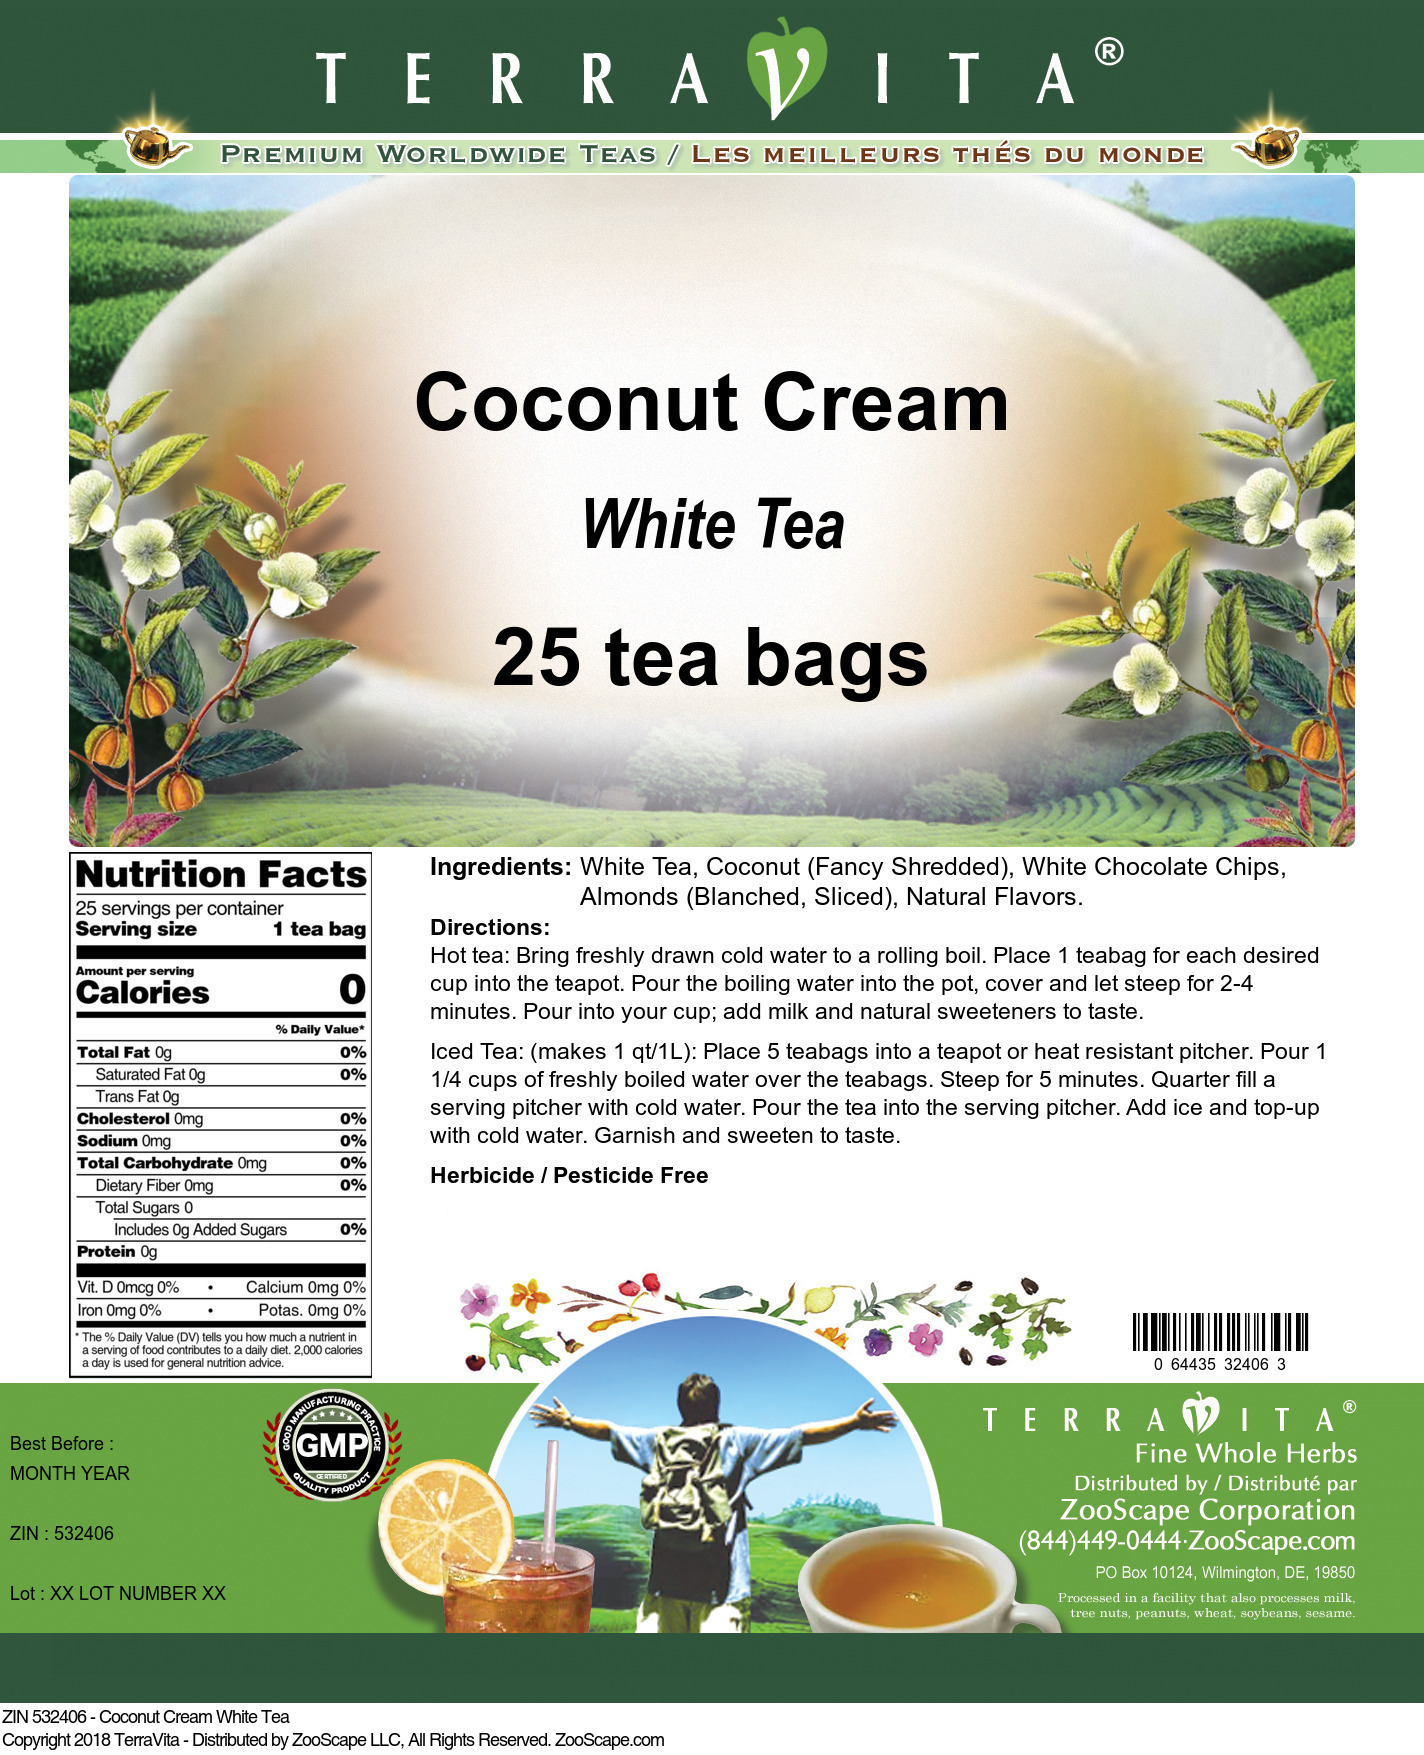 Coconut Cream White Tea